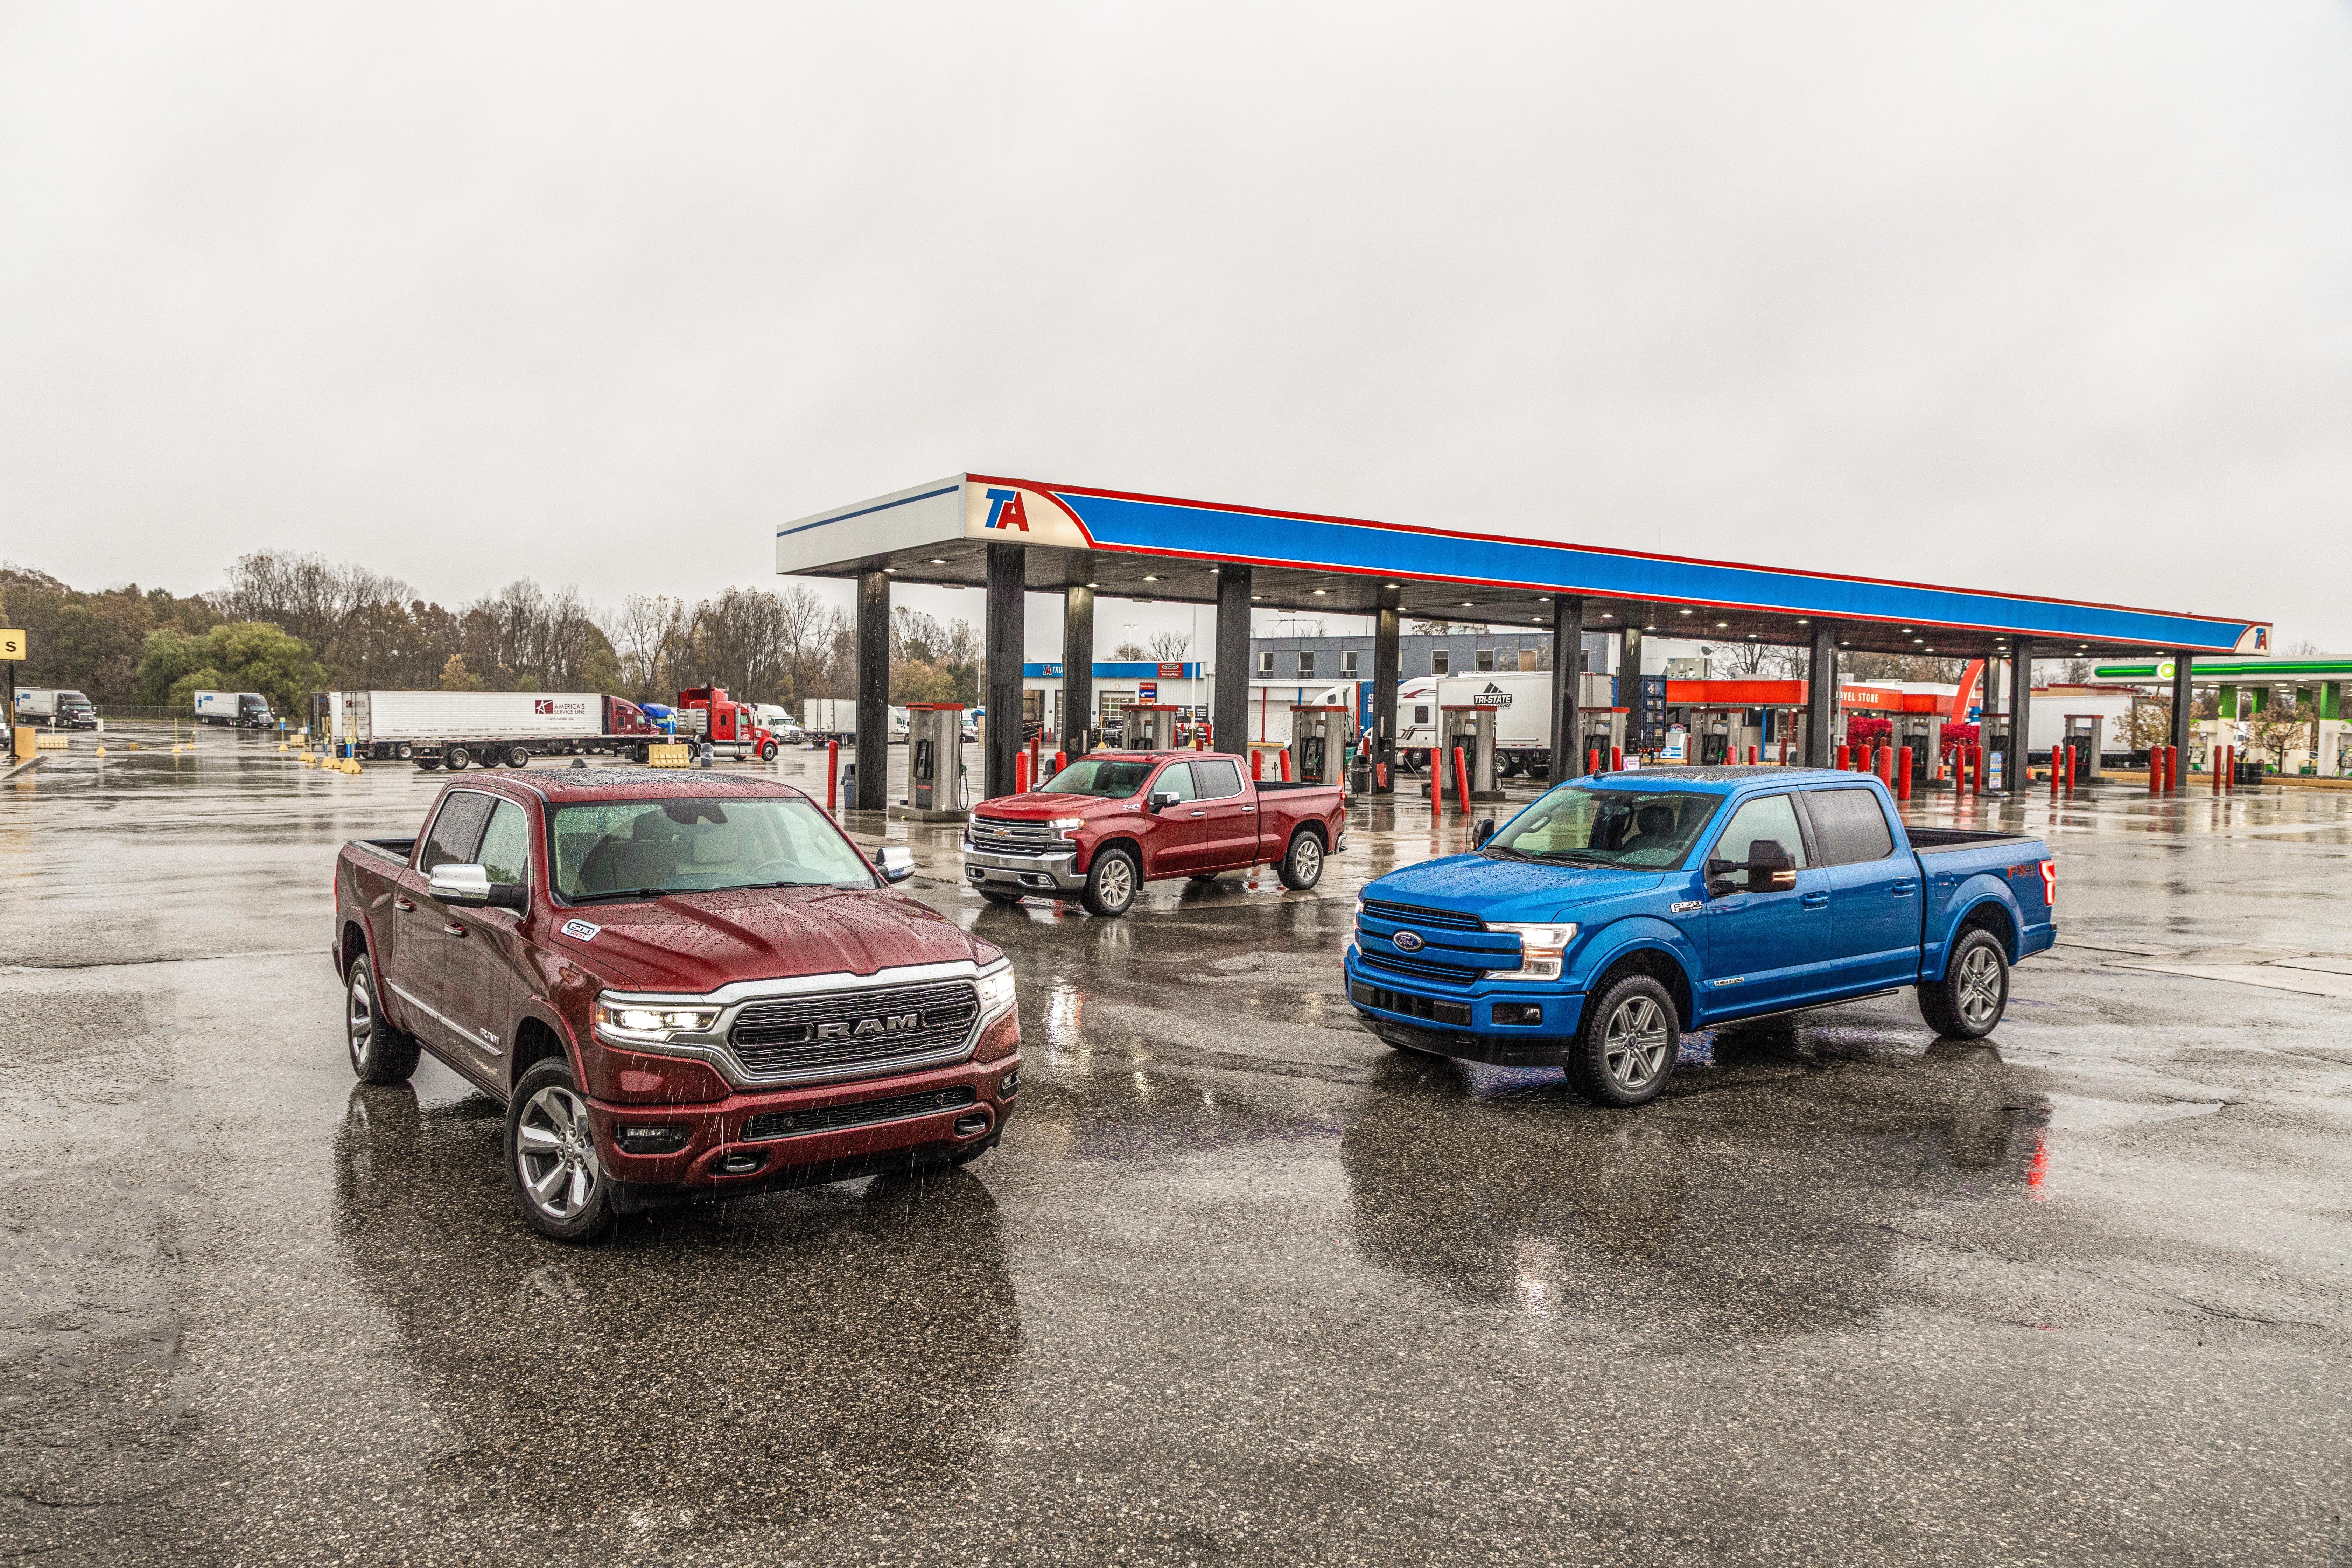 2020 chevrolet silverado duramax 2019 ford f 150 power stroke 2020 ram 1500 ecodiesel comparison 101 1579102688